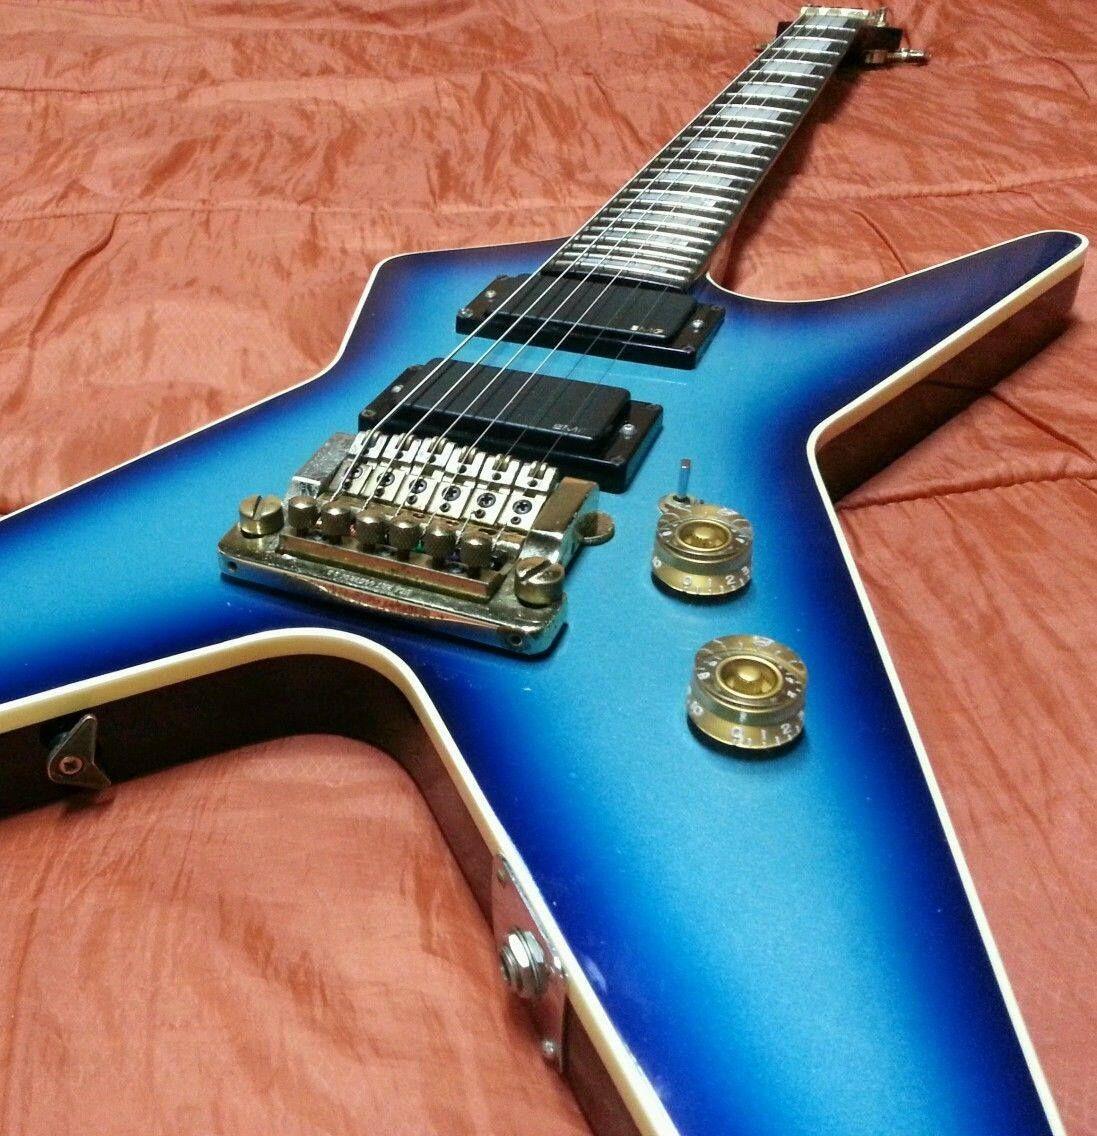 Dean guitar with a Kahler tremolo   Guitars with Kahler